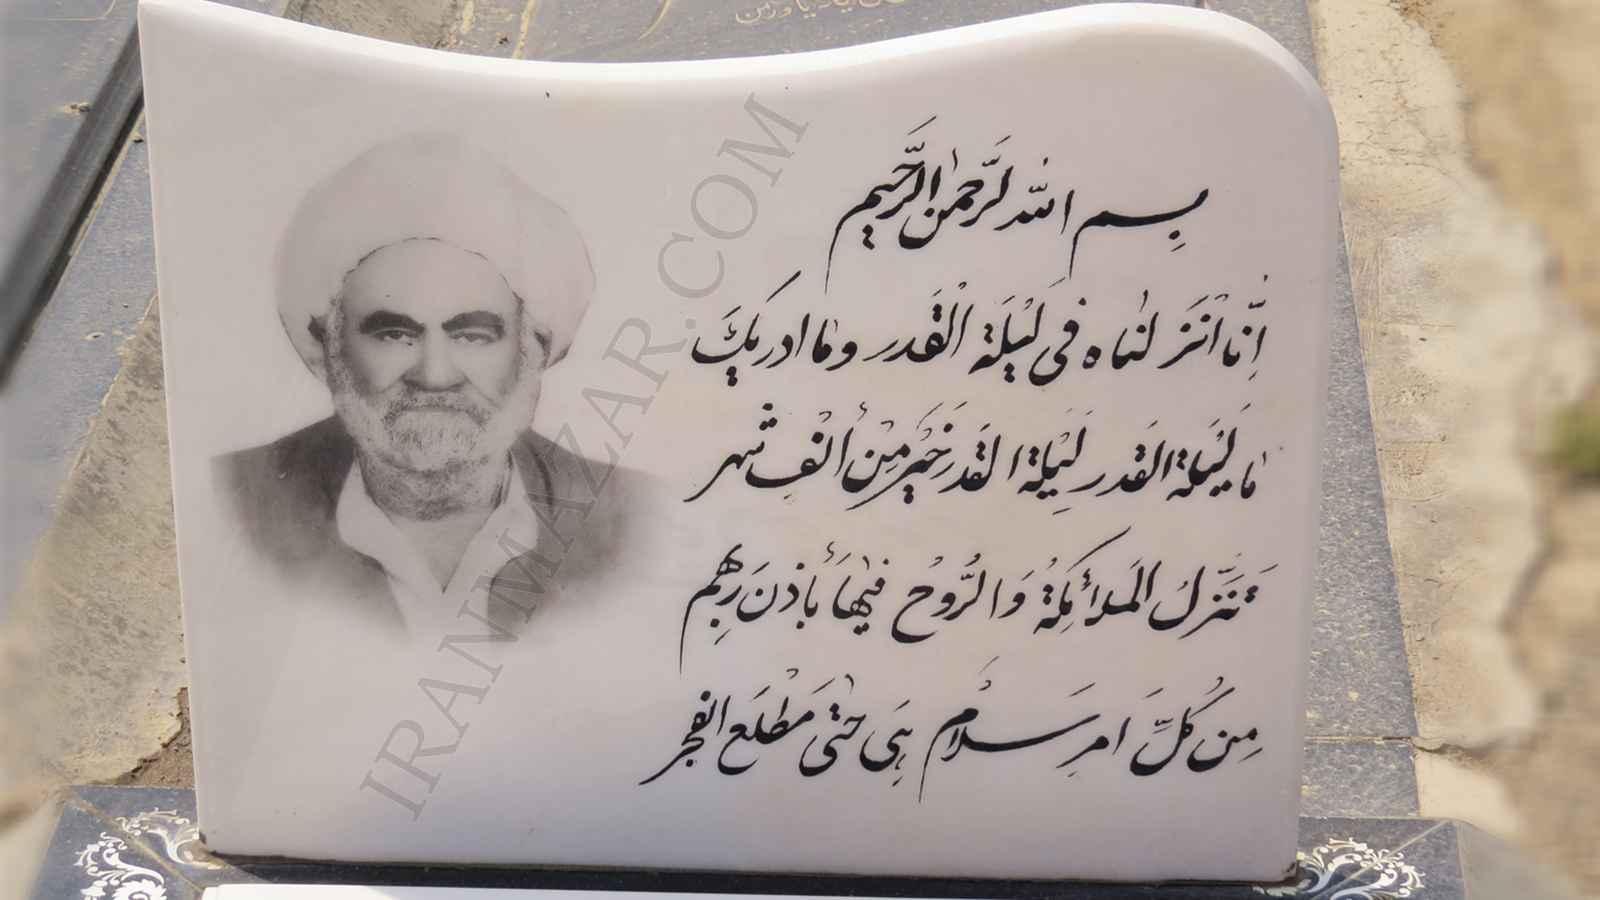 سنگ قبر نانو کد N106 - ایران مزار